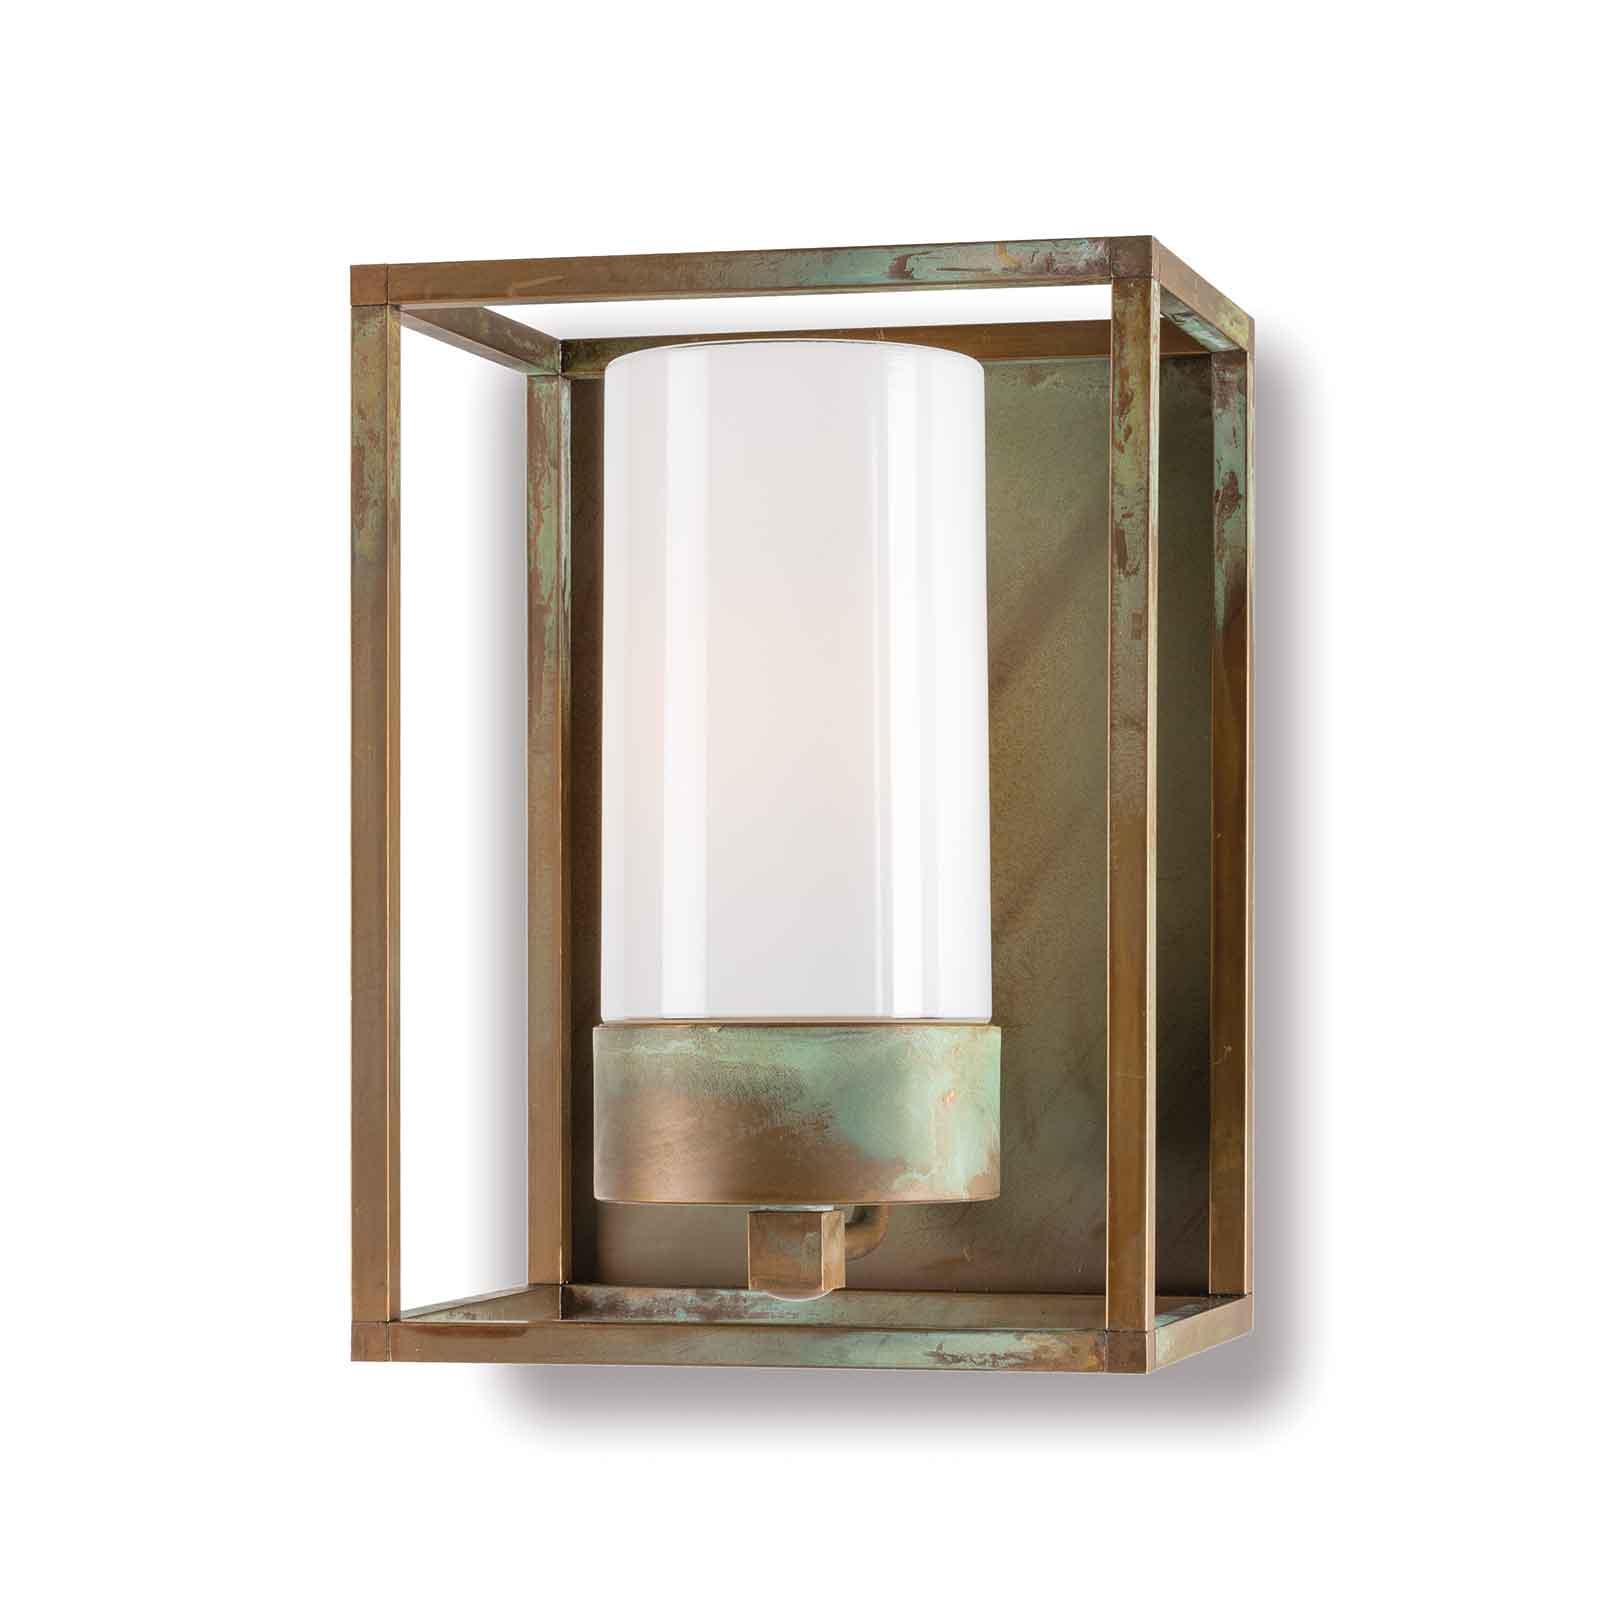 Ulkoseinälamppu Cubic³ 3366 messinki/opaali